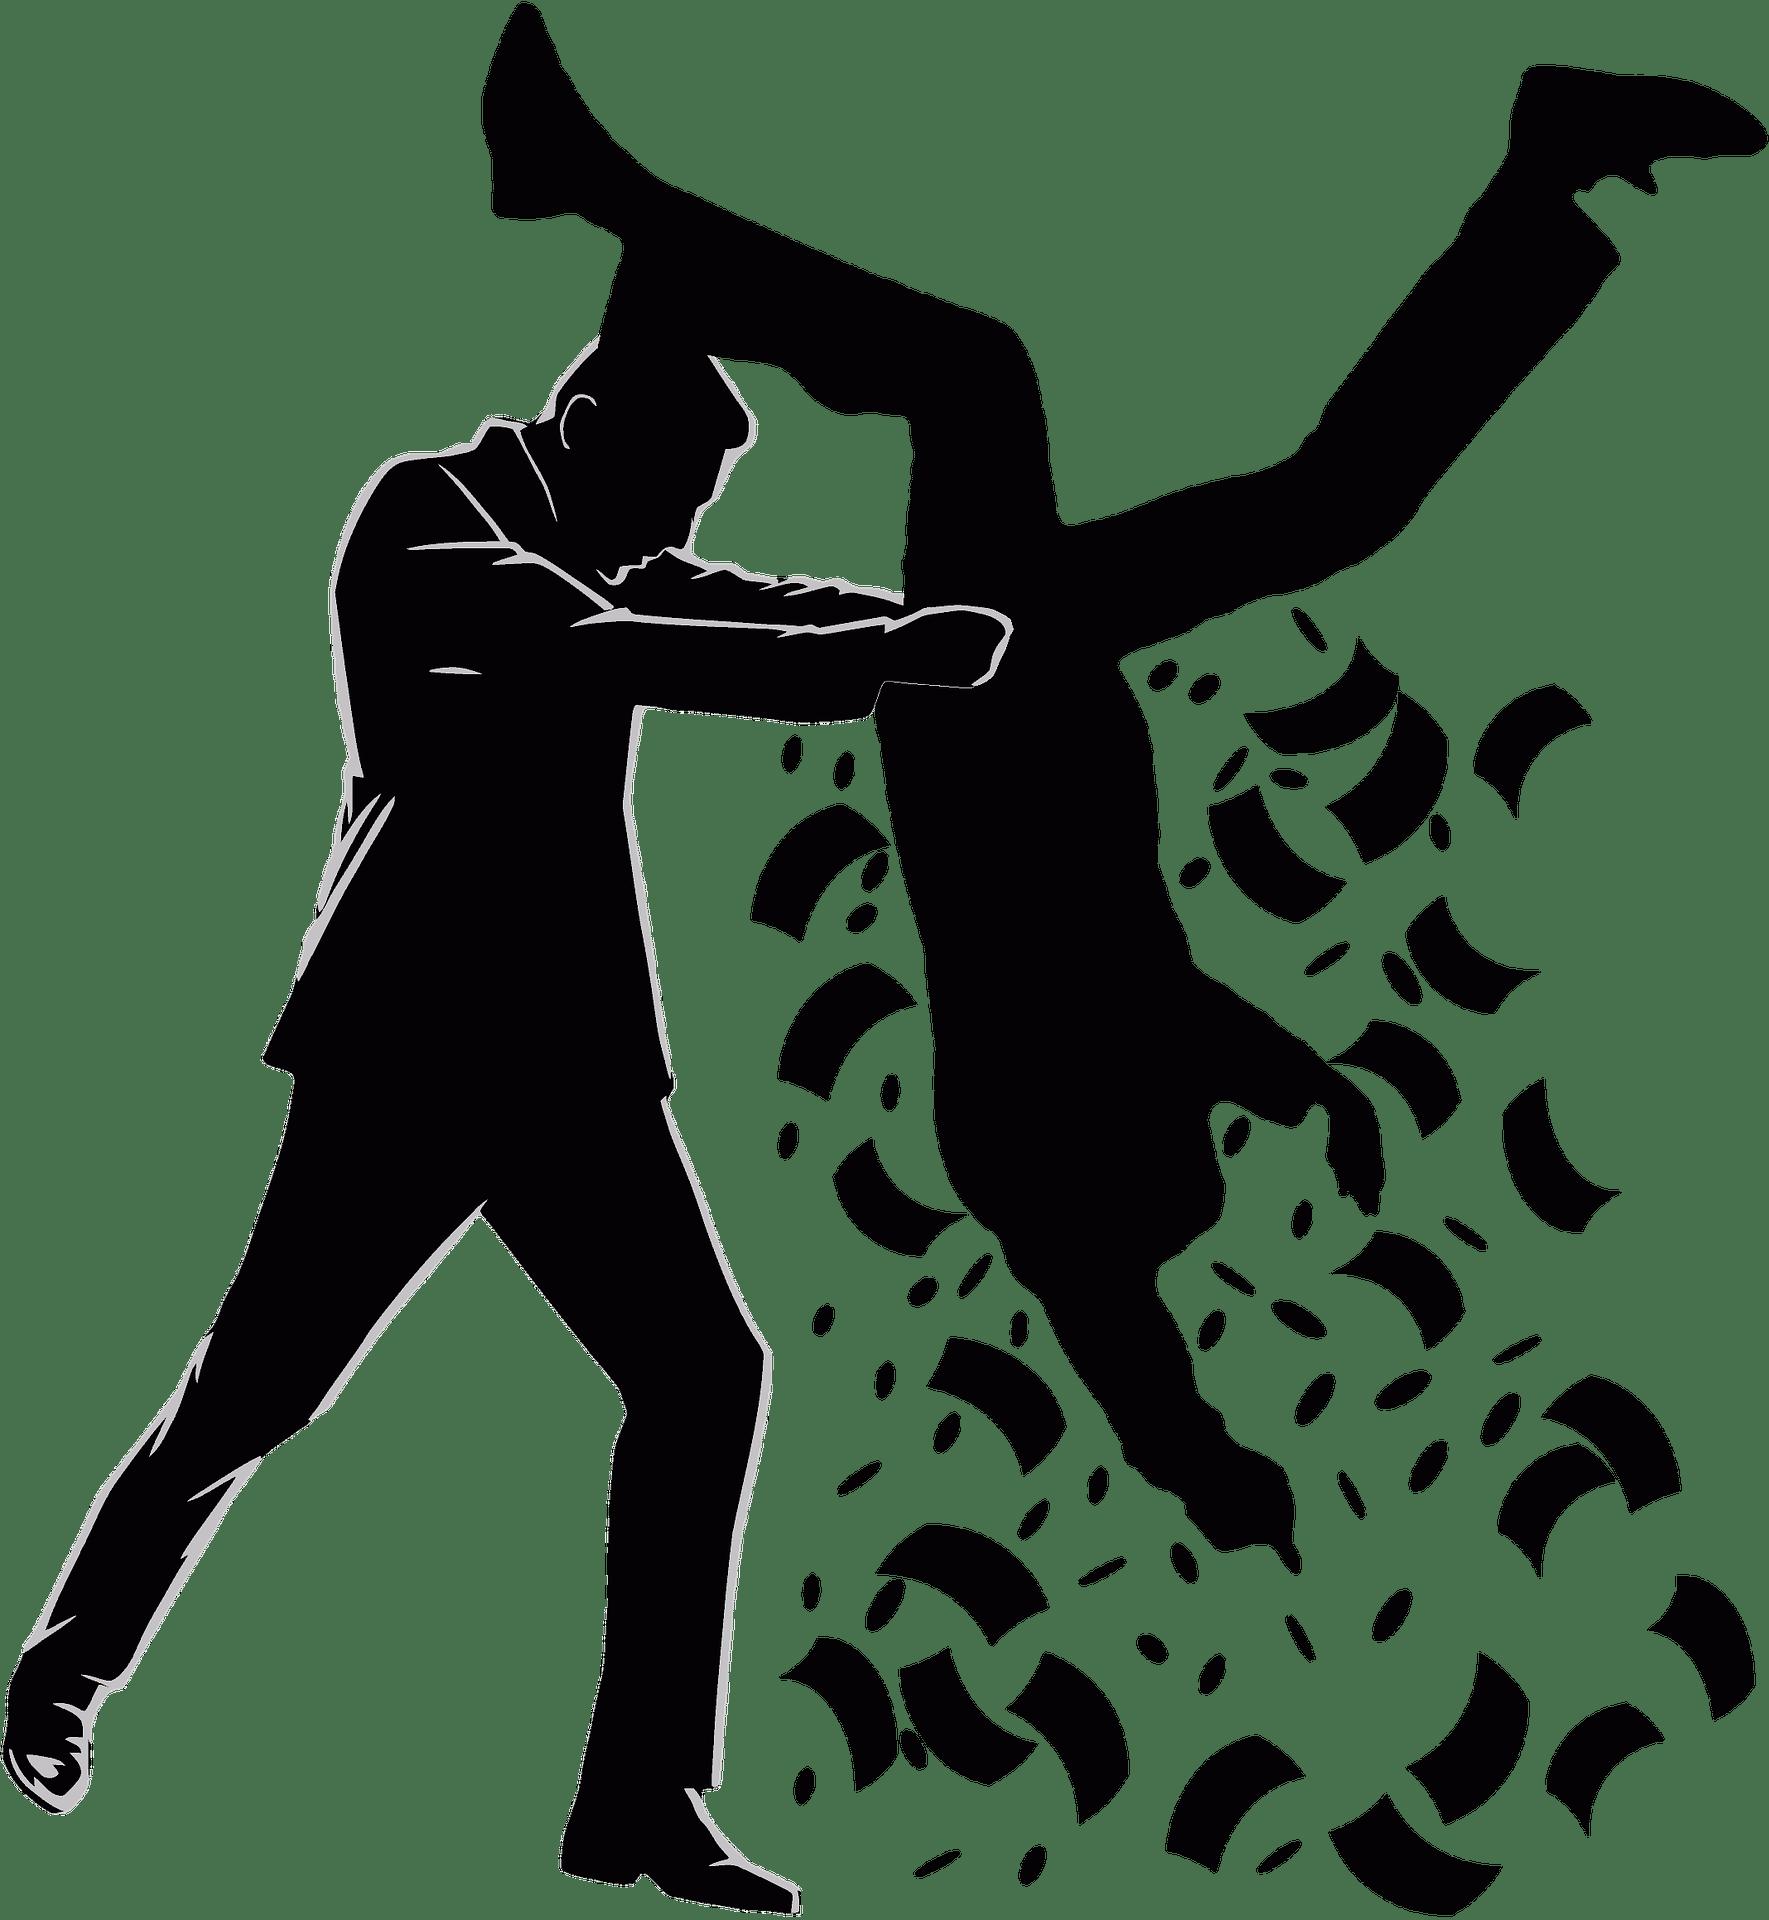 Bargeldabschaffung